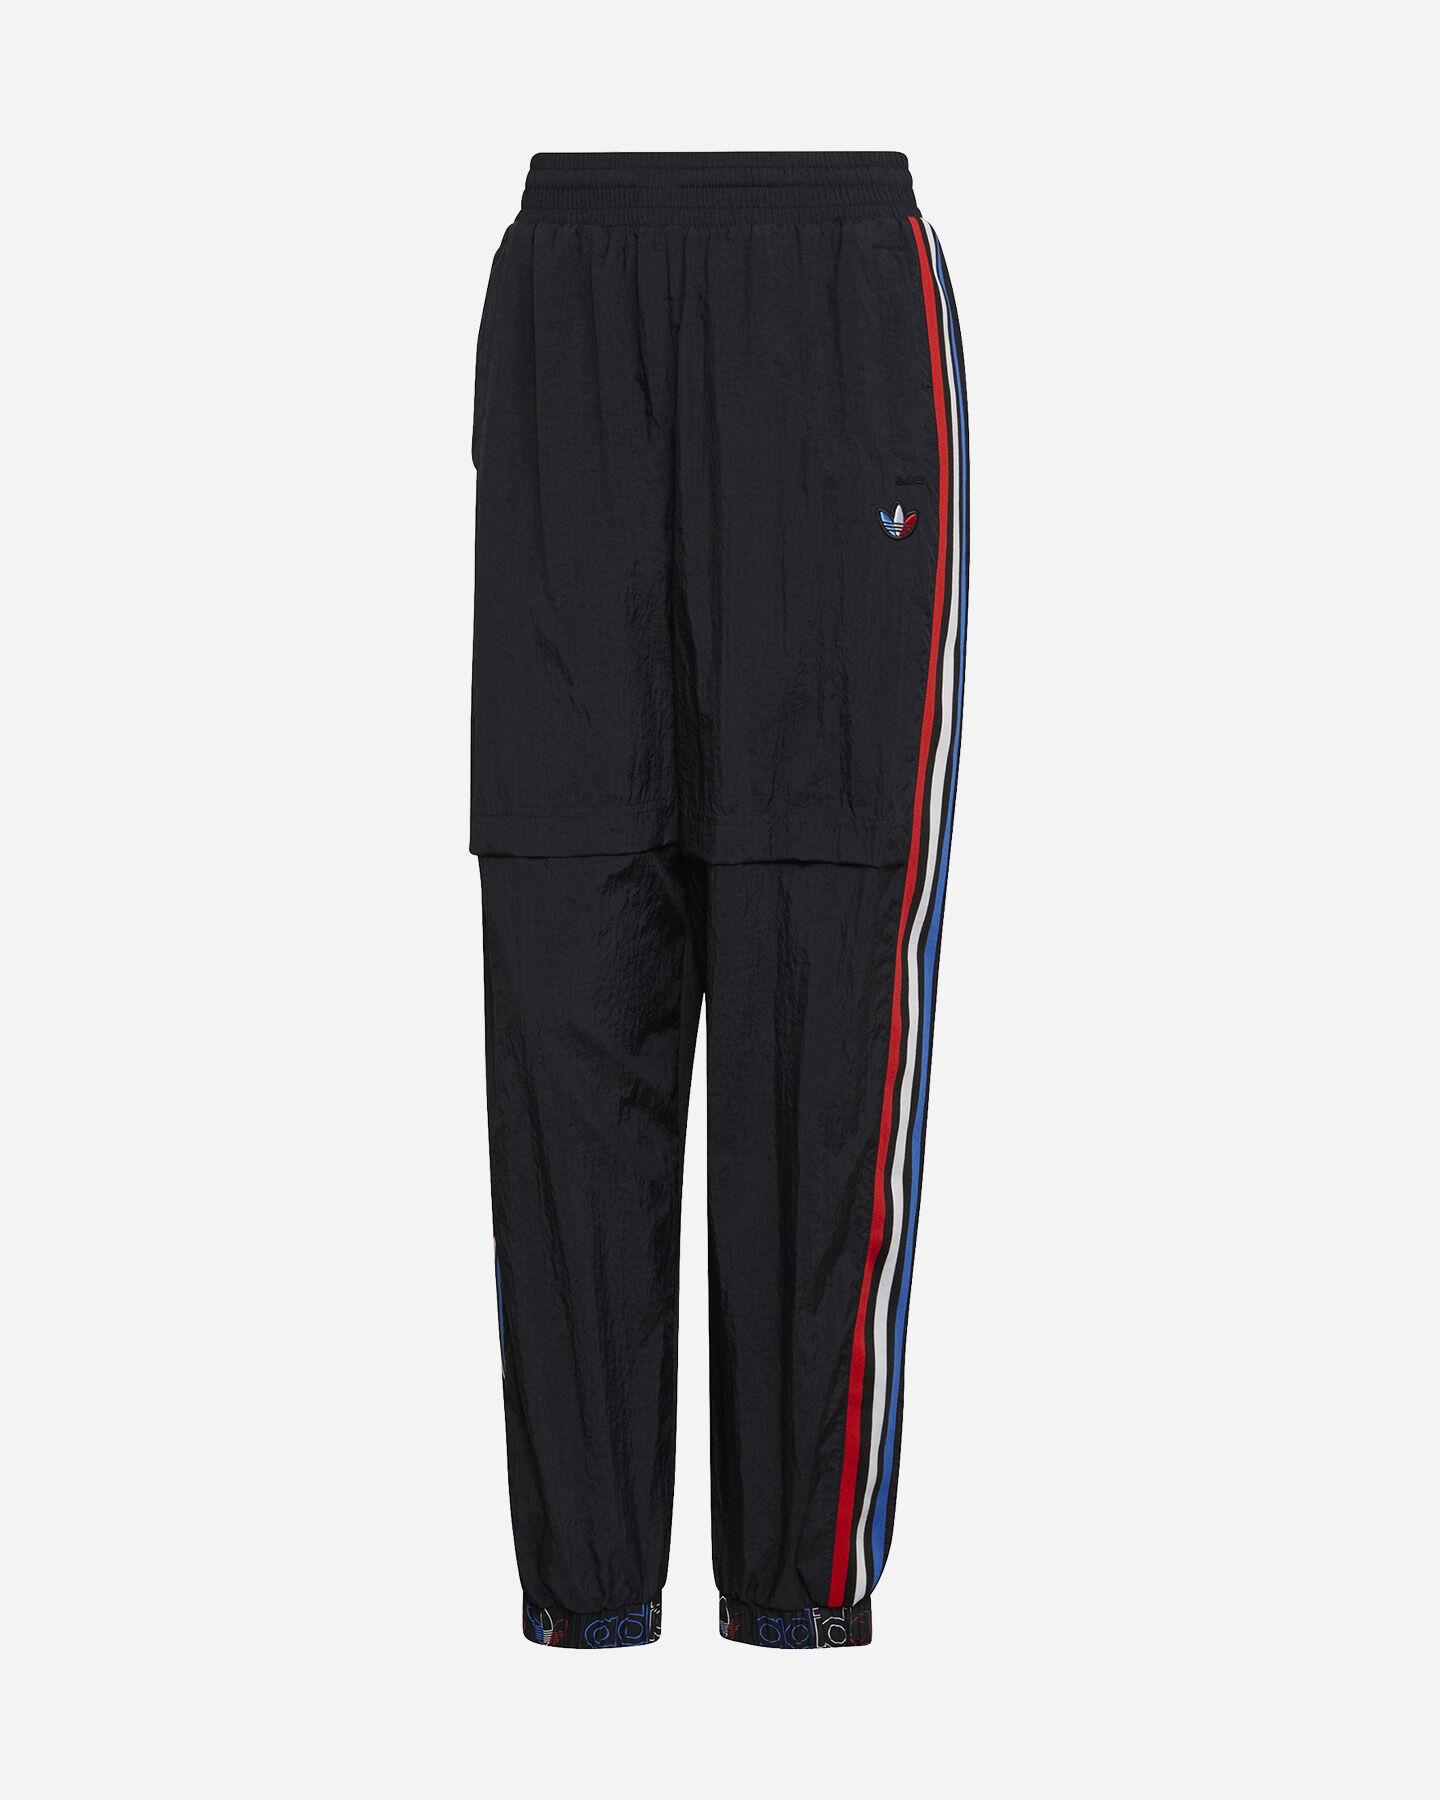 Pantalone ADIDAS ADICOLOR TRICOLOR JAPONA W S5272950 scatto 0